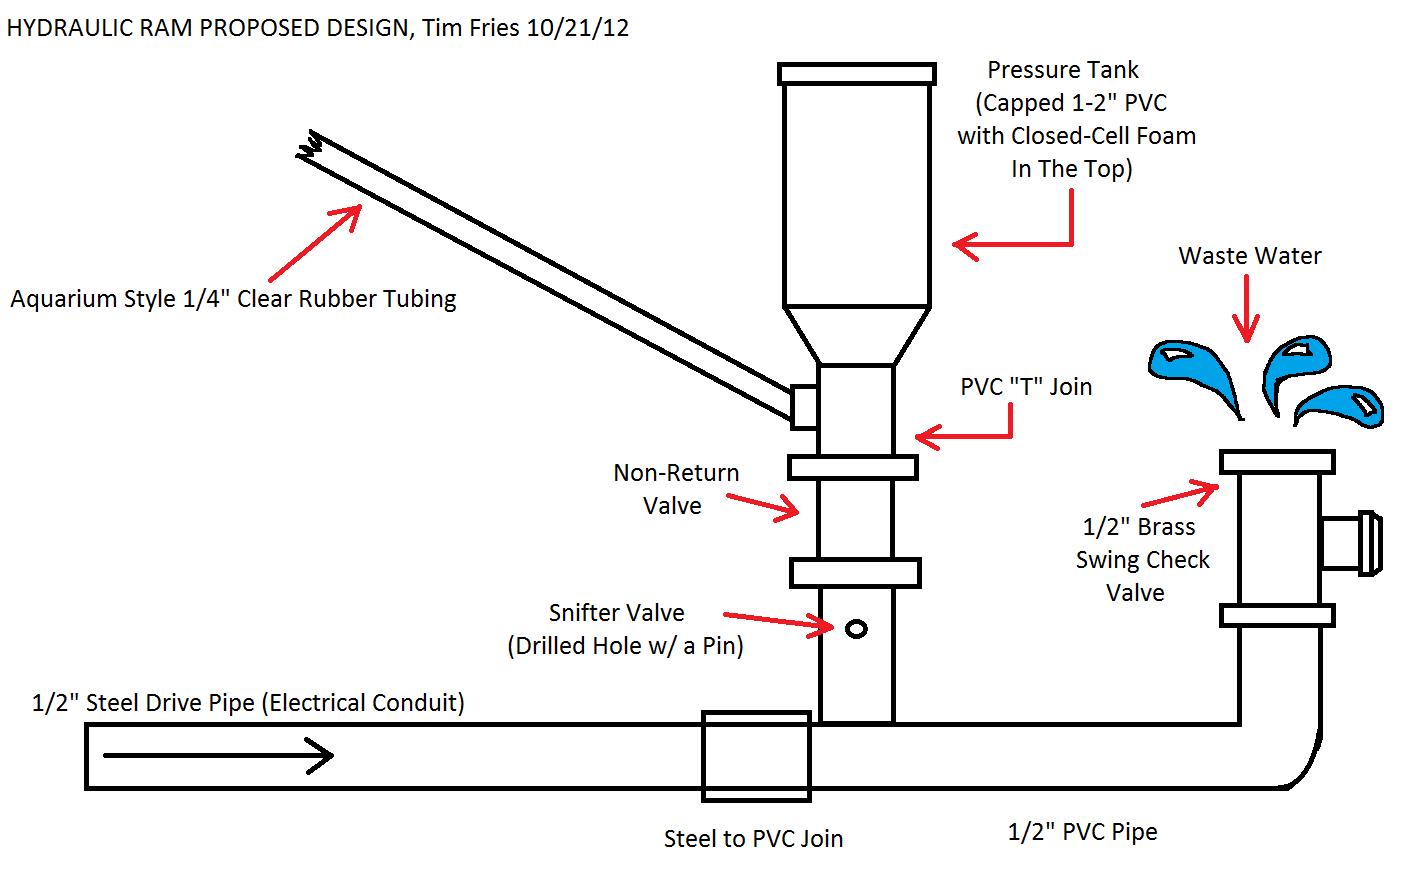 hydraulic ram diagram vw golf mk1 headlight wiring file design concept png wikimedia commons